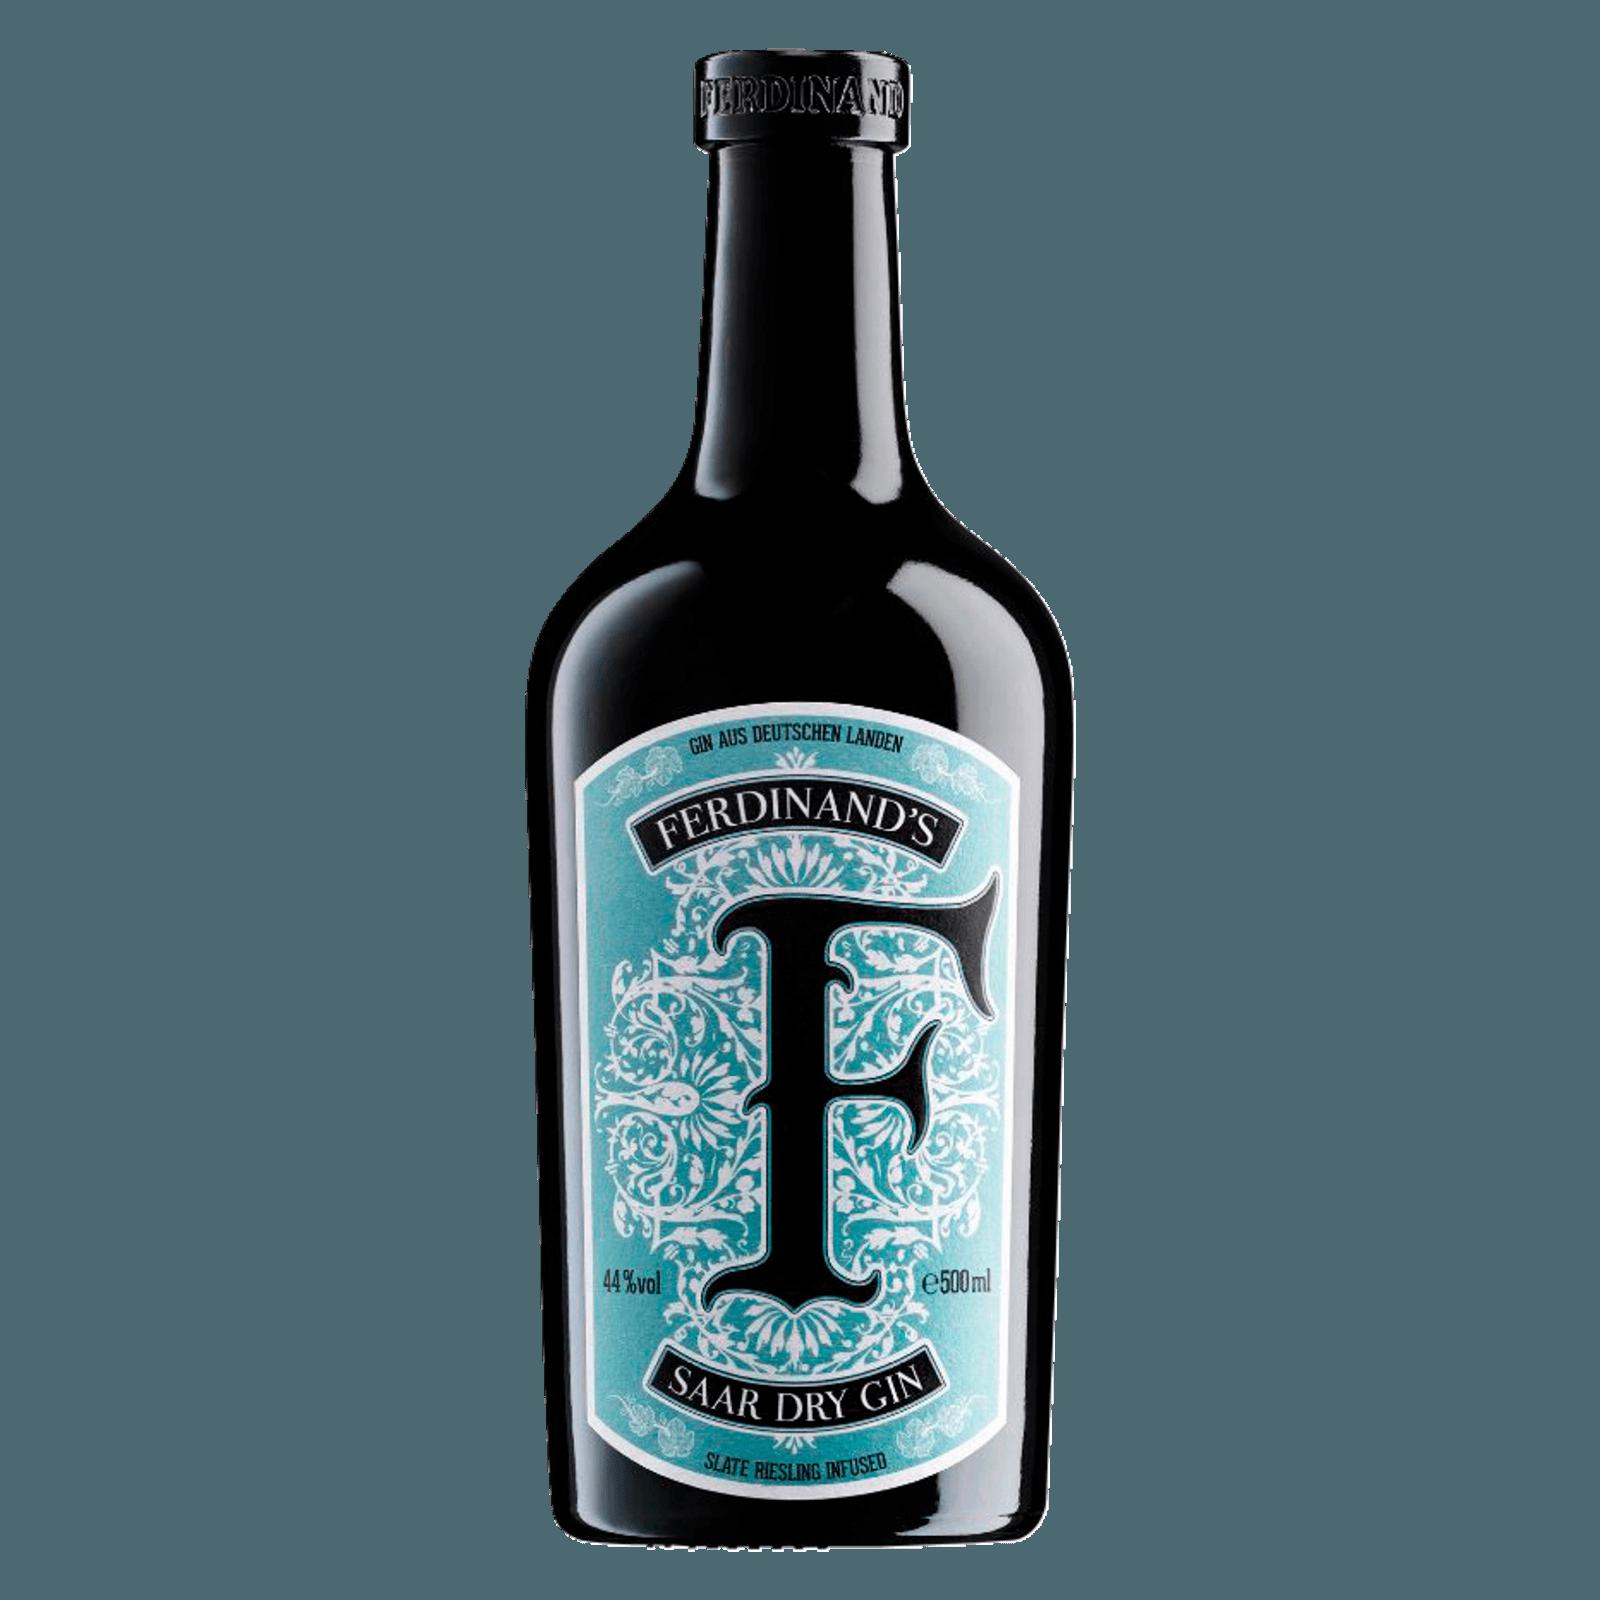 Ferdinand\'s Saar Dry Gin 0,5l bei REWE online bestellen!